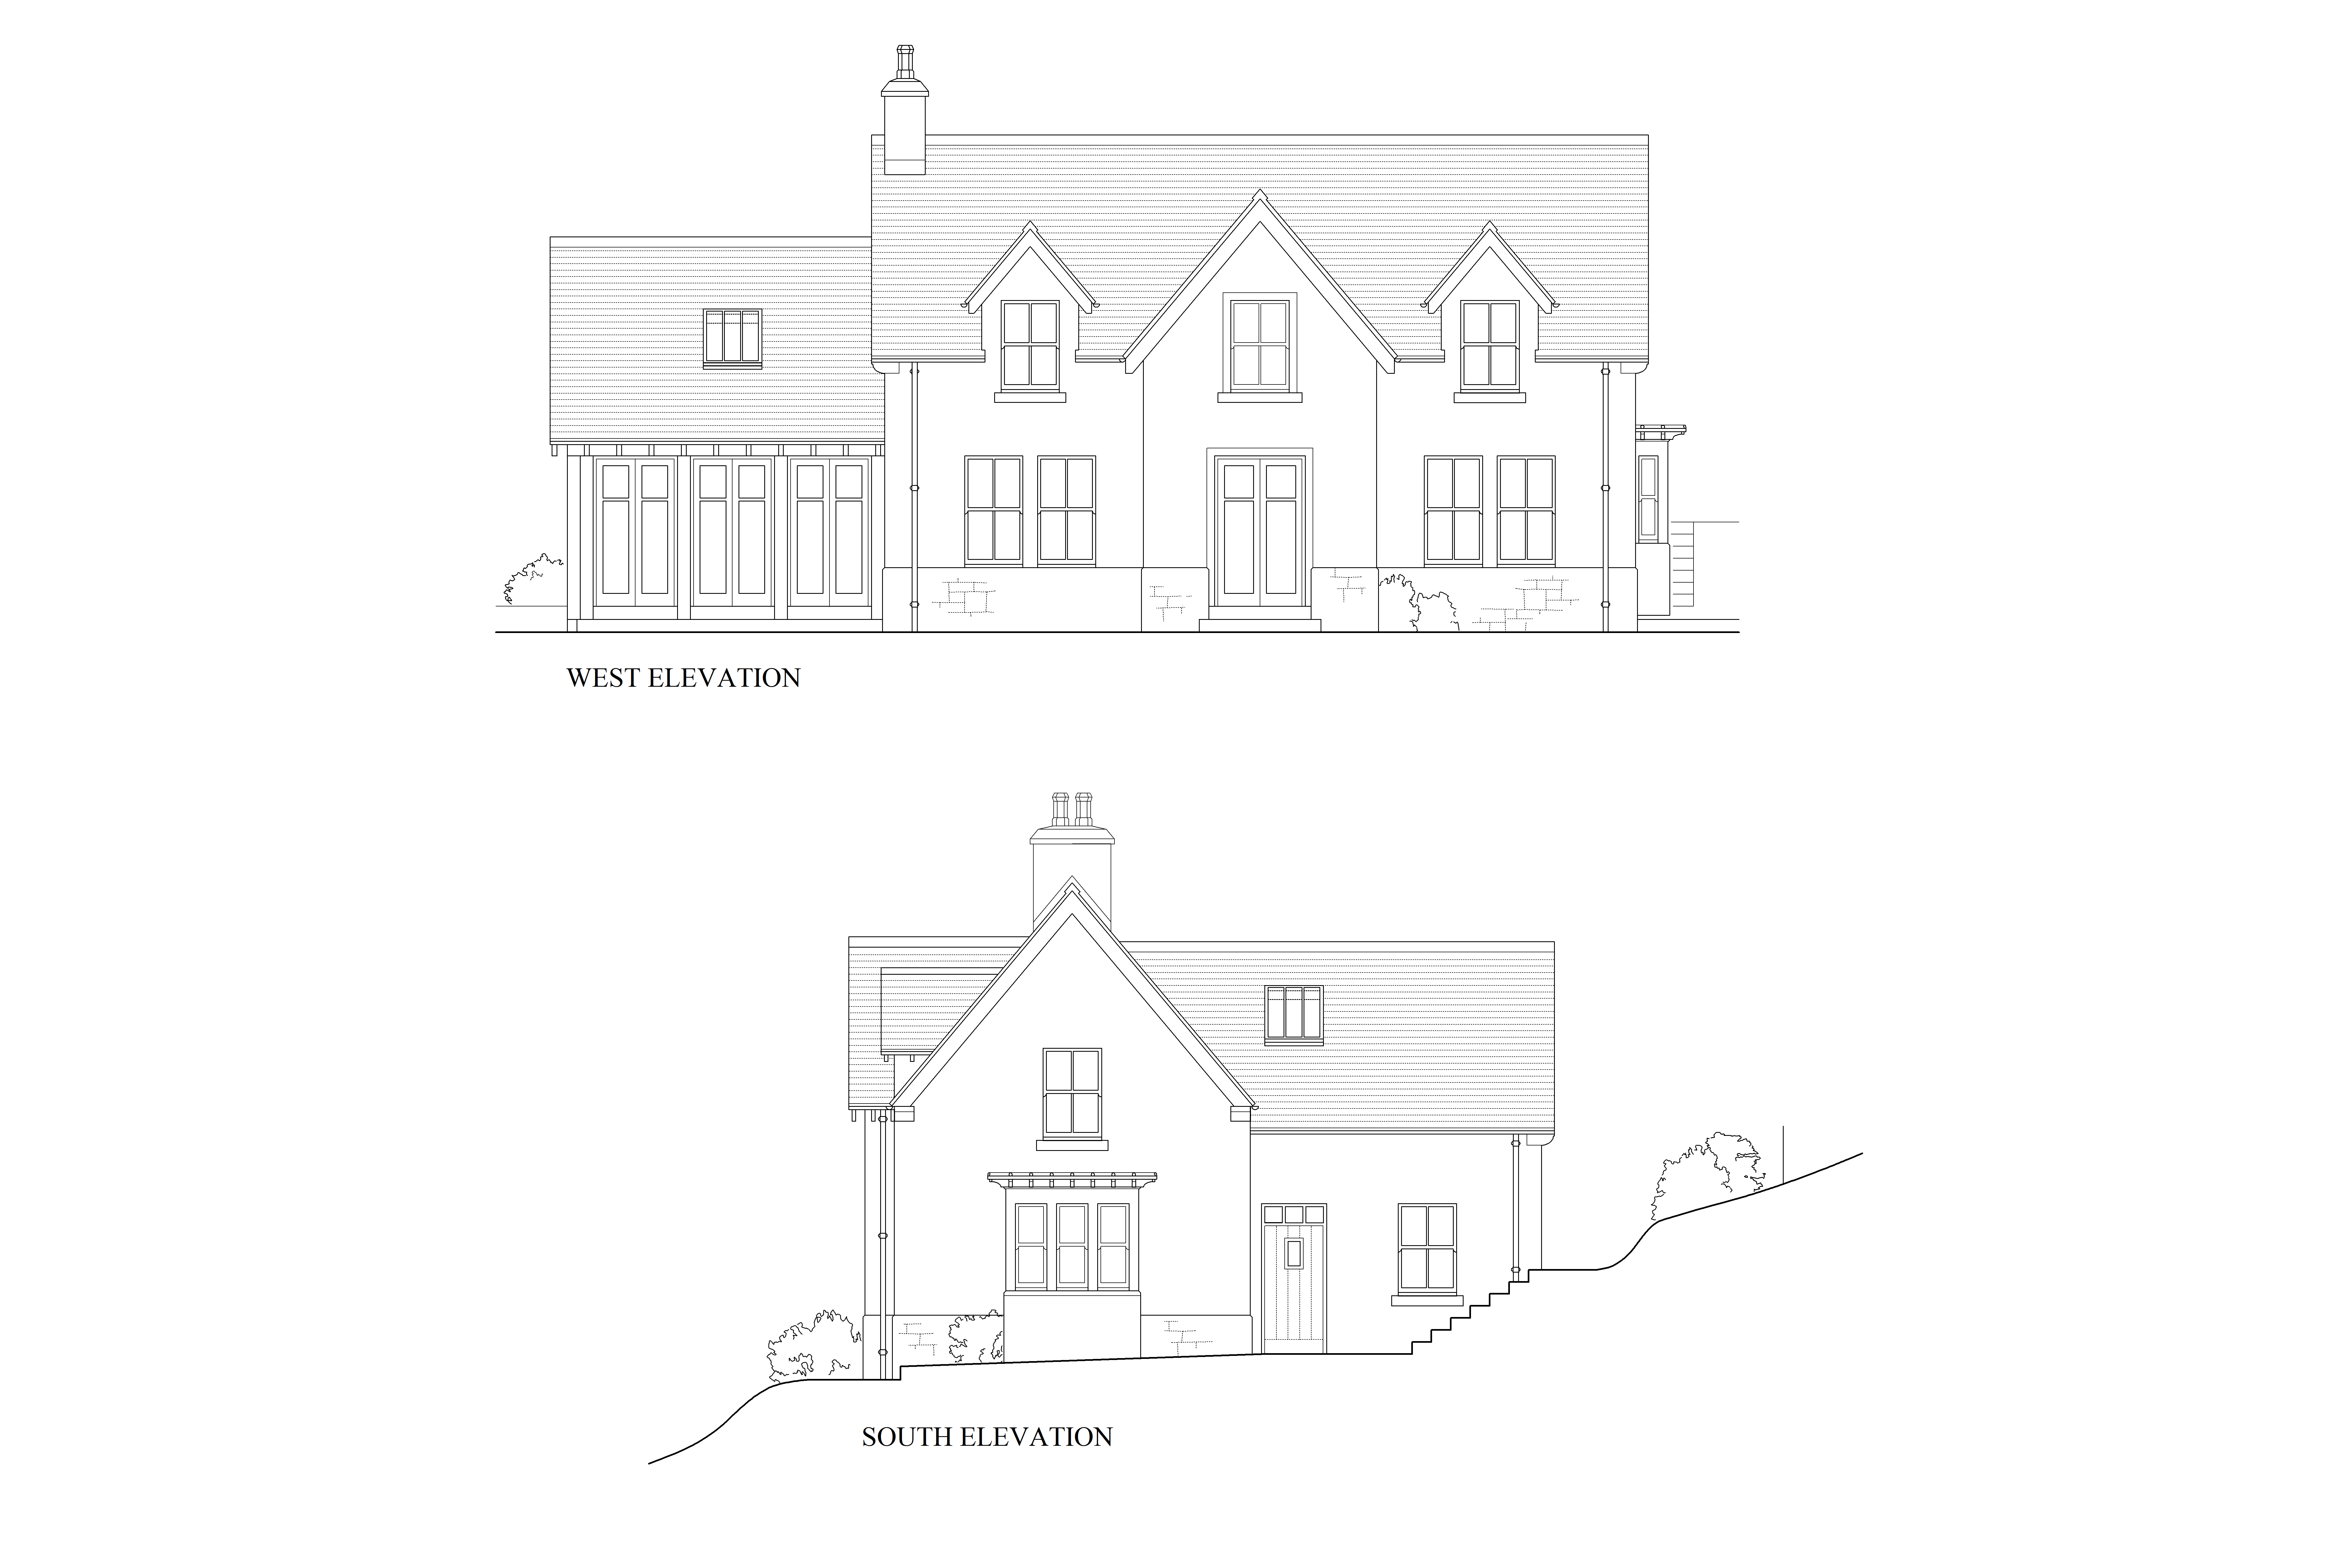 New vernacular house near Tongue, Scotland